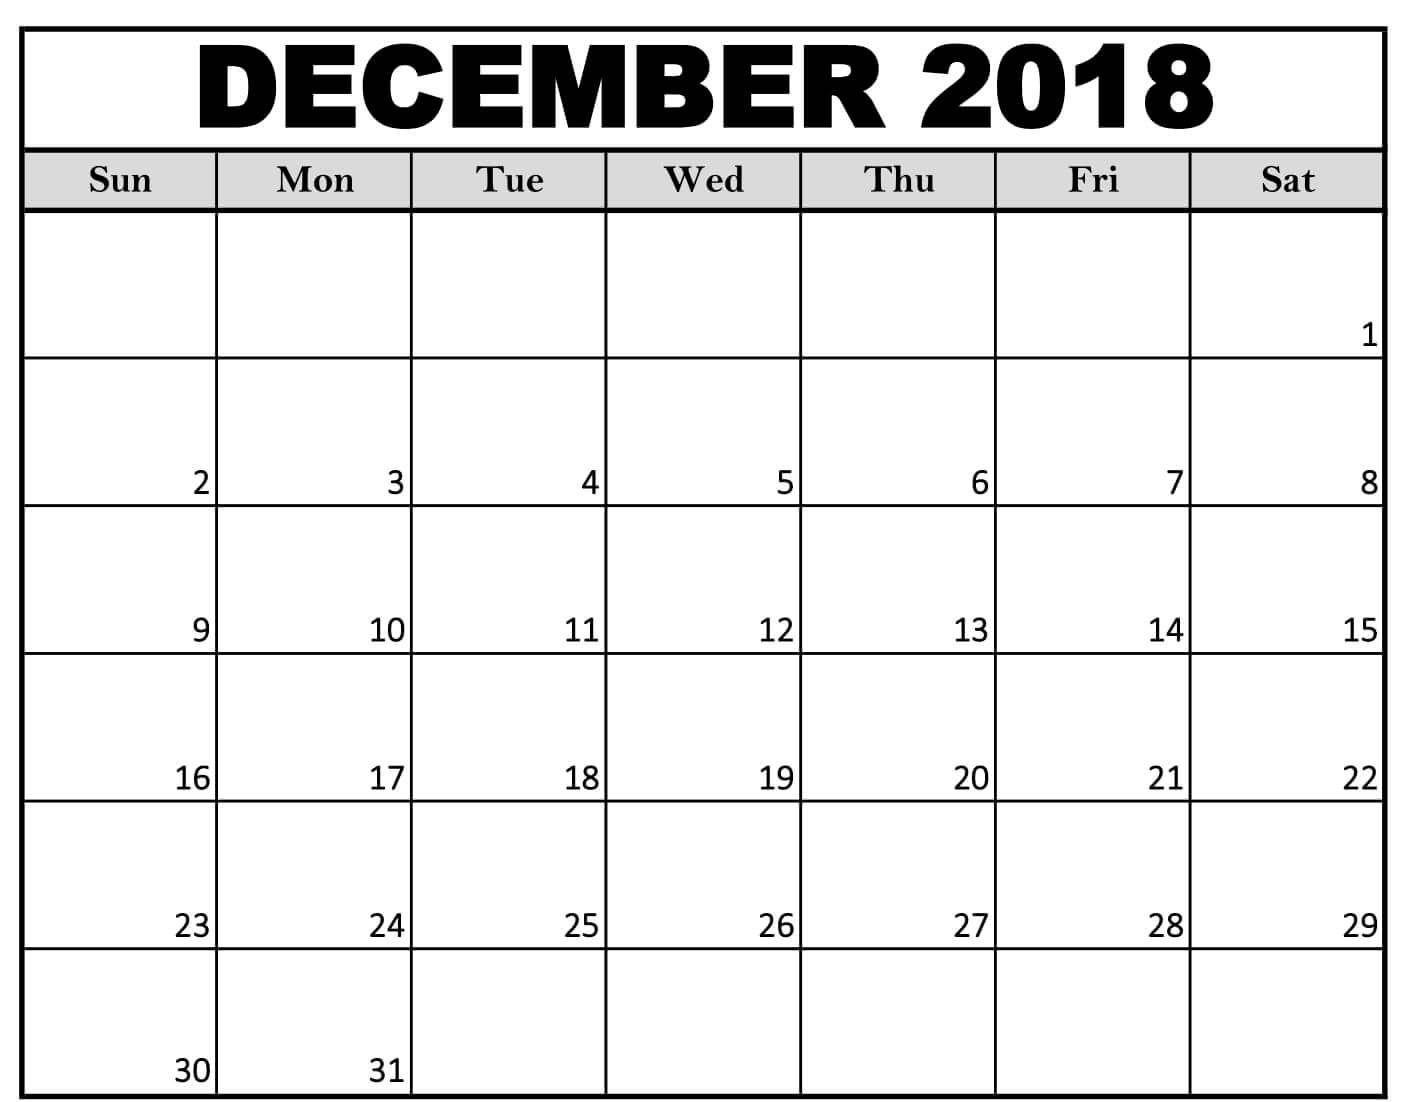 December 2018 Calendar Landscape #December2018Calendar #December2018 #Calendars | December